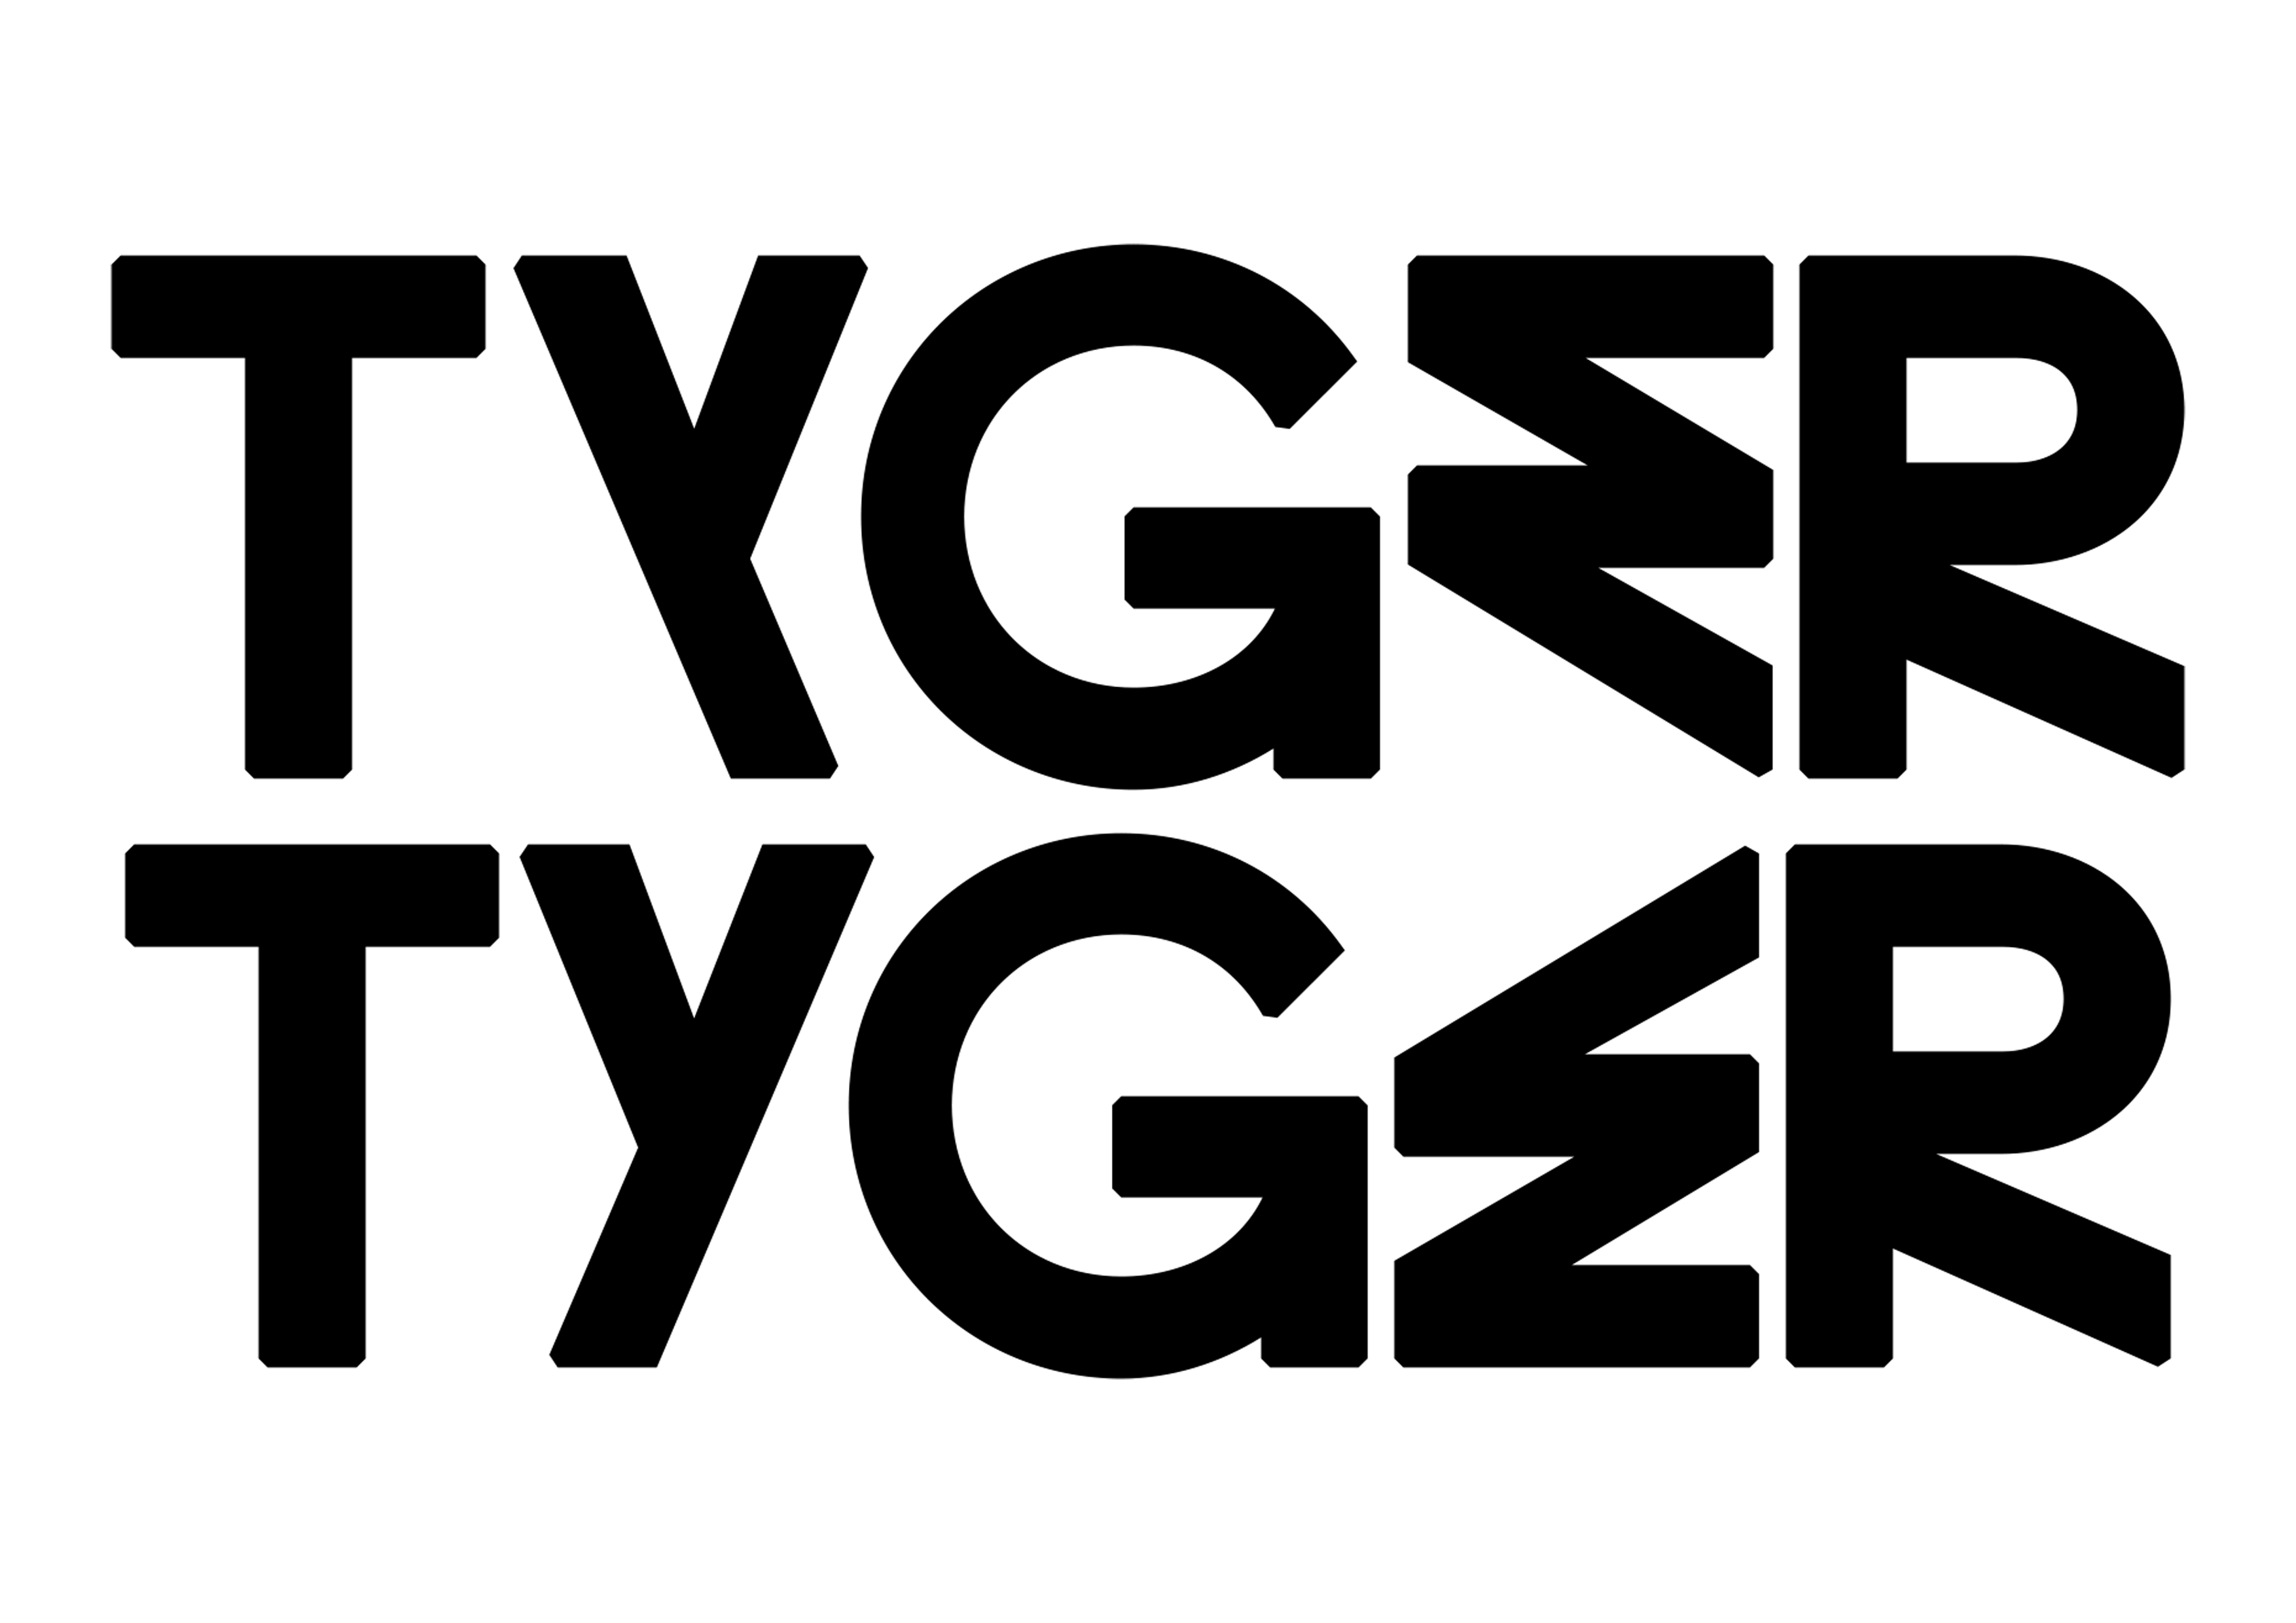 tyty-logo-temp-1